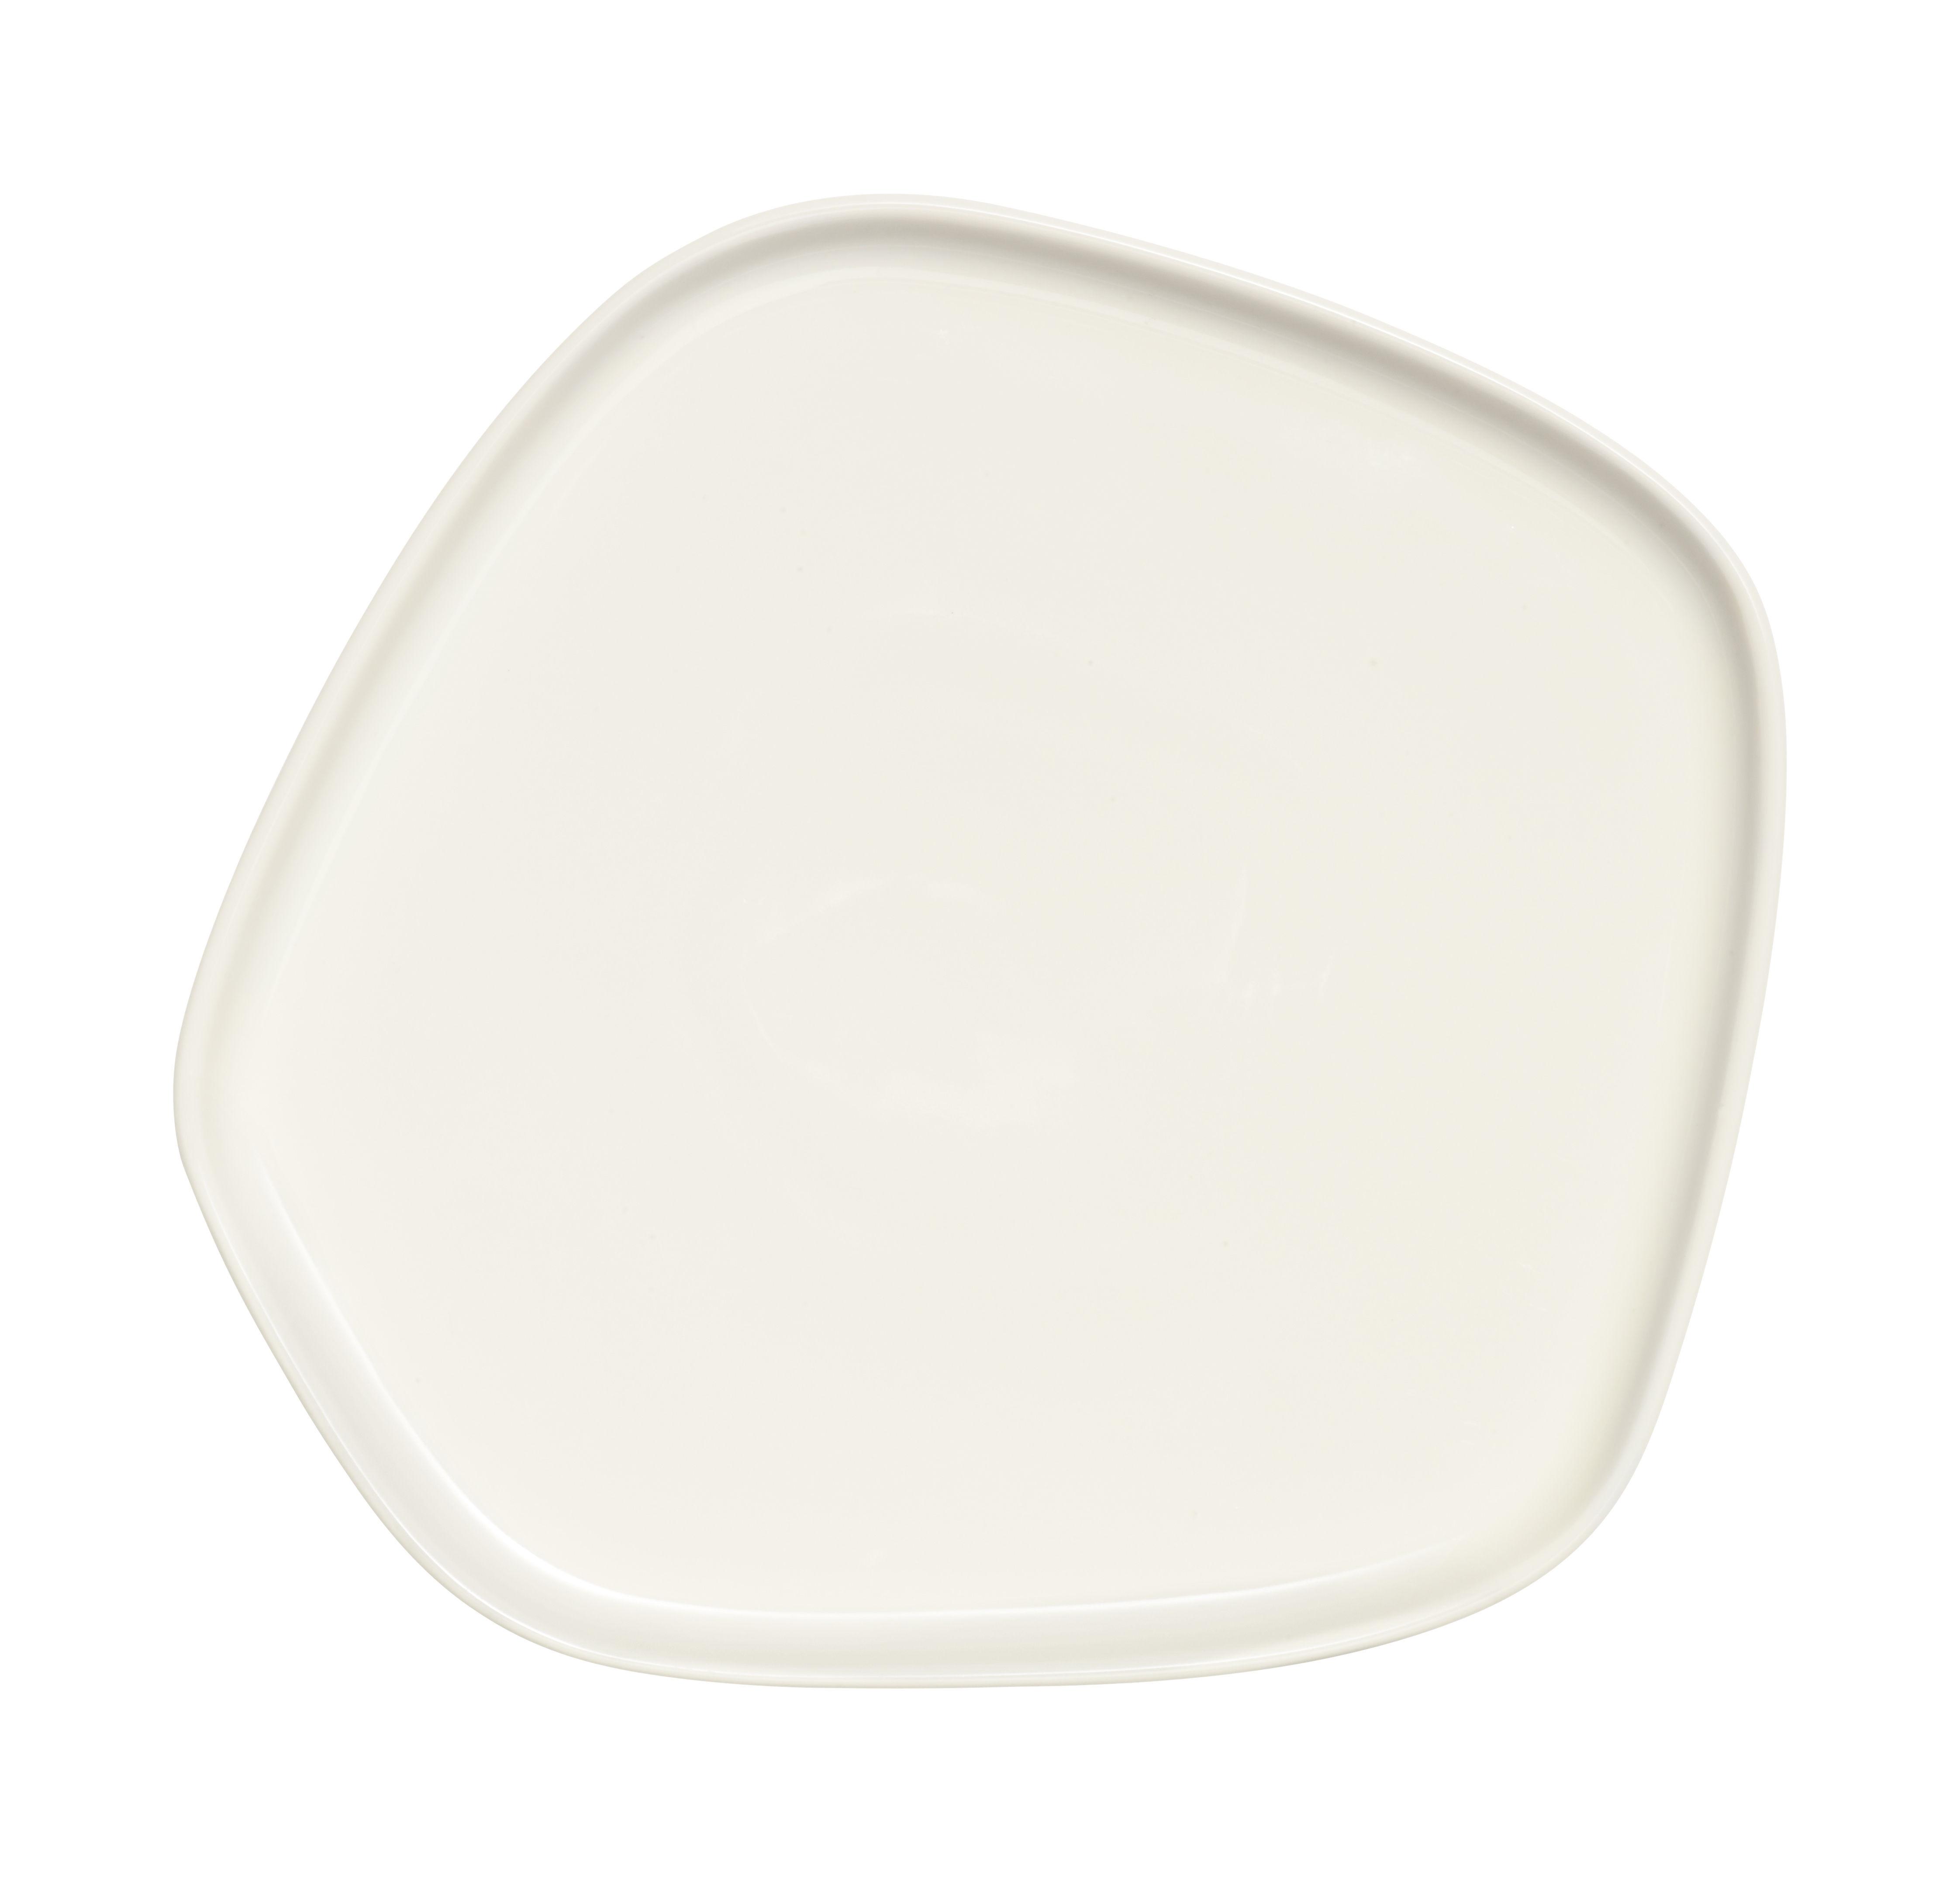 Arts de la table - Assiettes - Assiette Iittala X Issey Miyake / 21 x 20 cm - Iittala - Blanc - Porcelaine